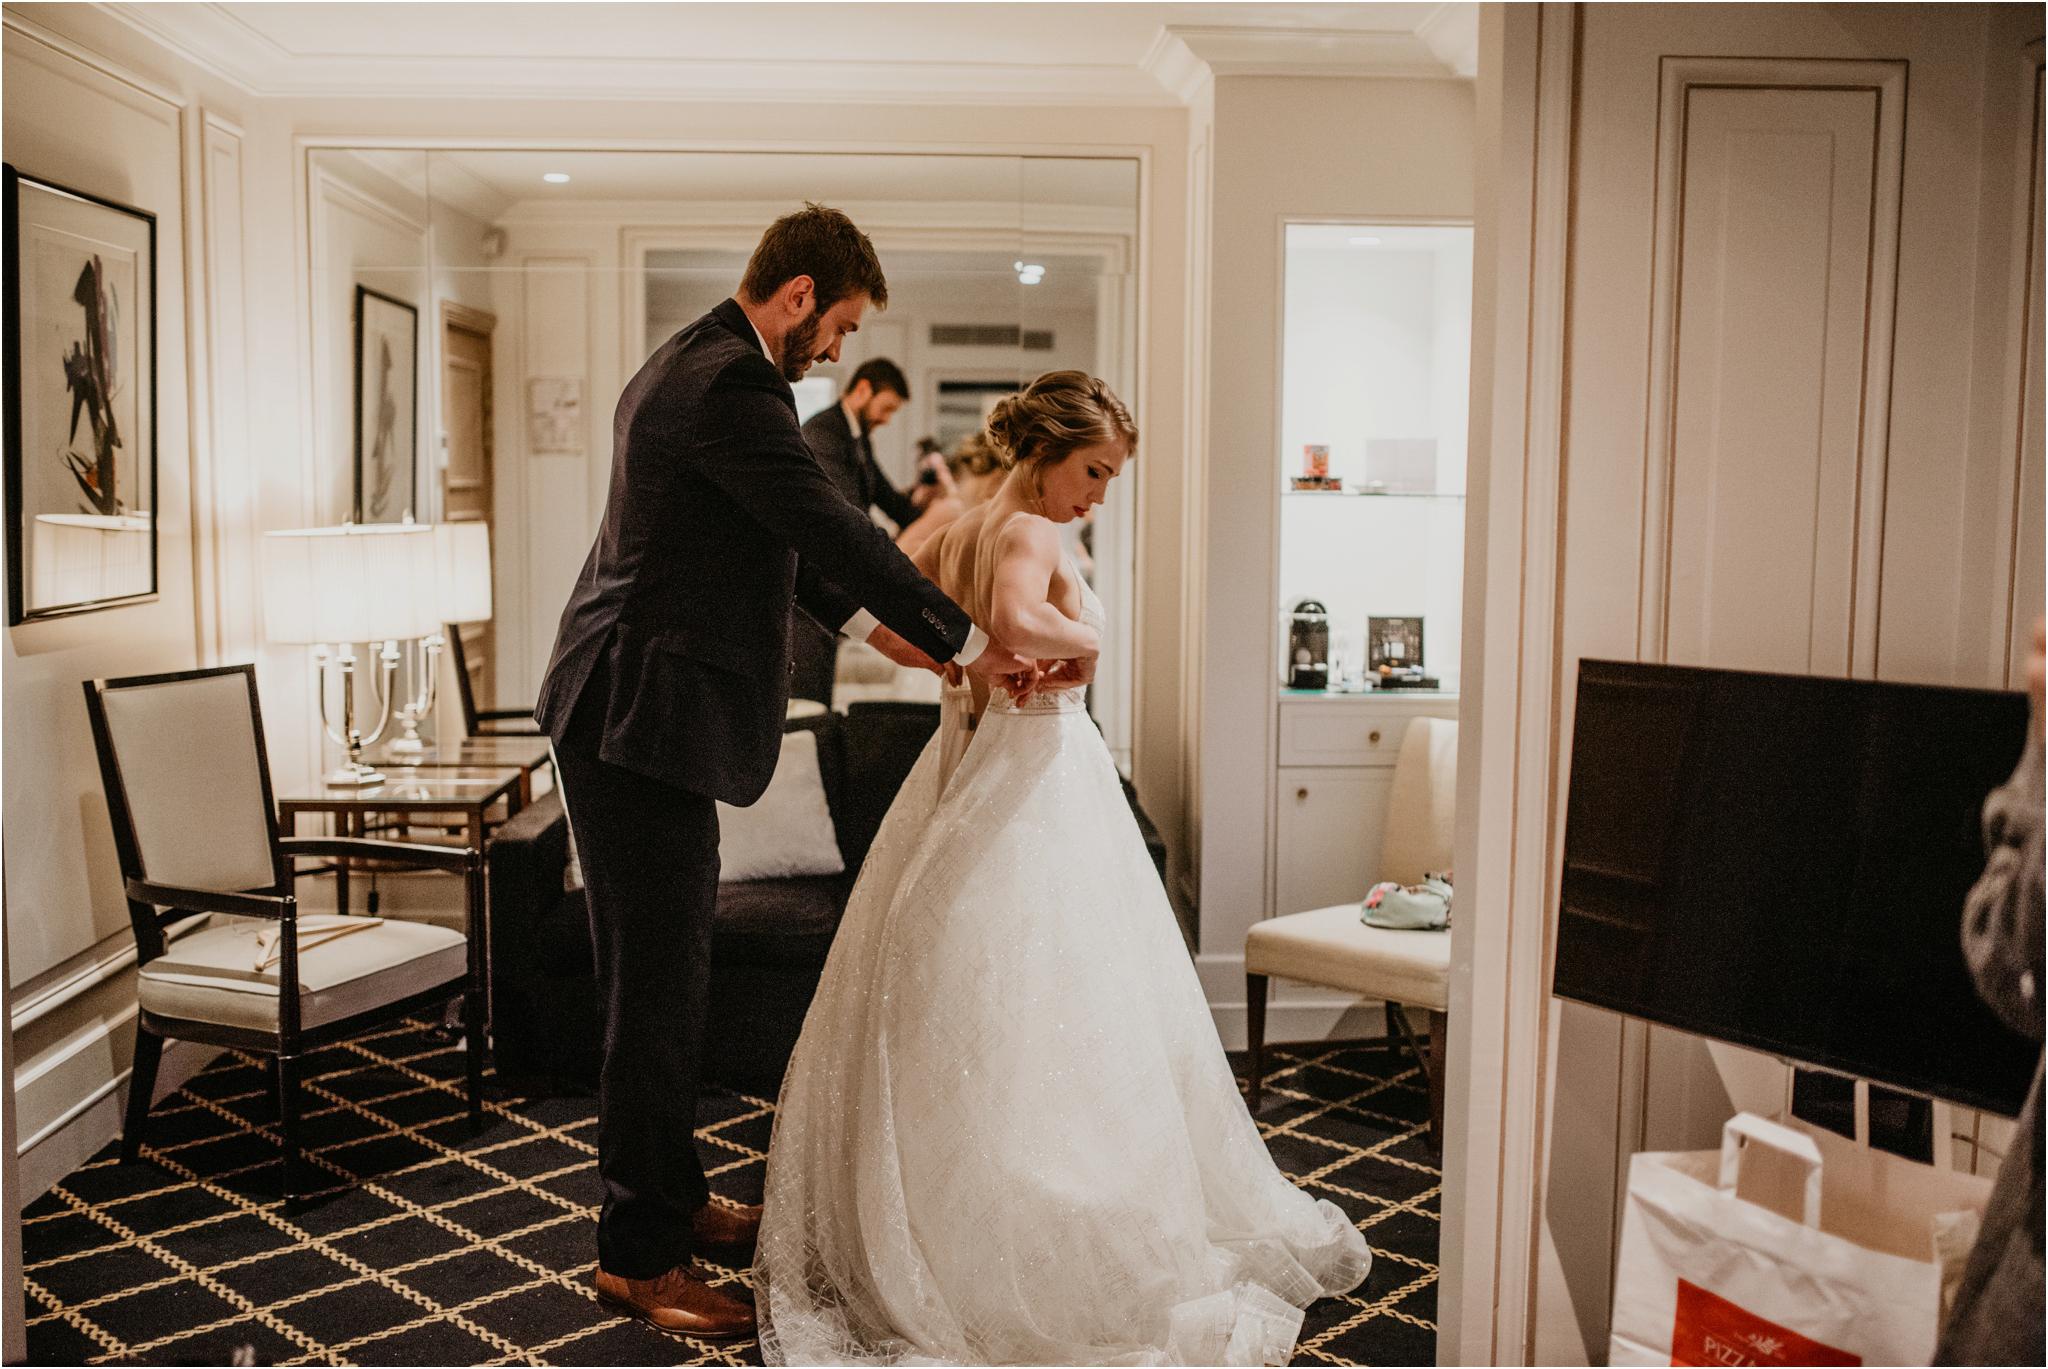 miranda-and-jared-paris-elopement-destination-wedding-photographer-013.jpg